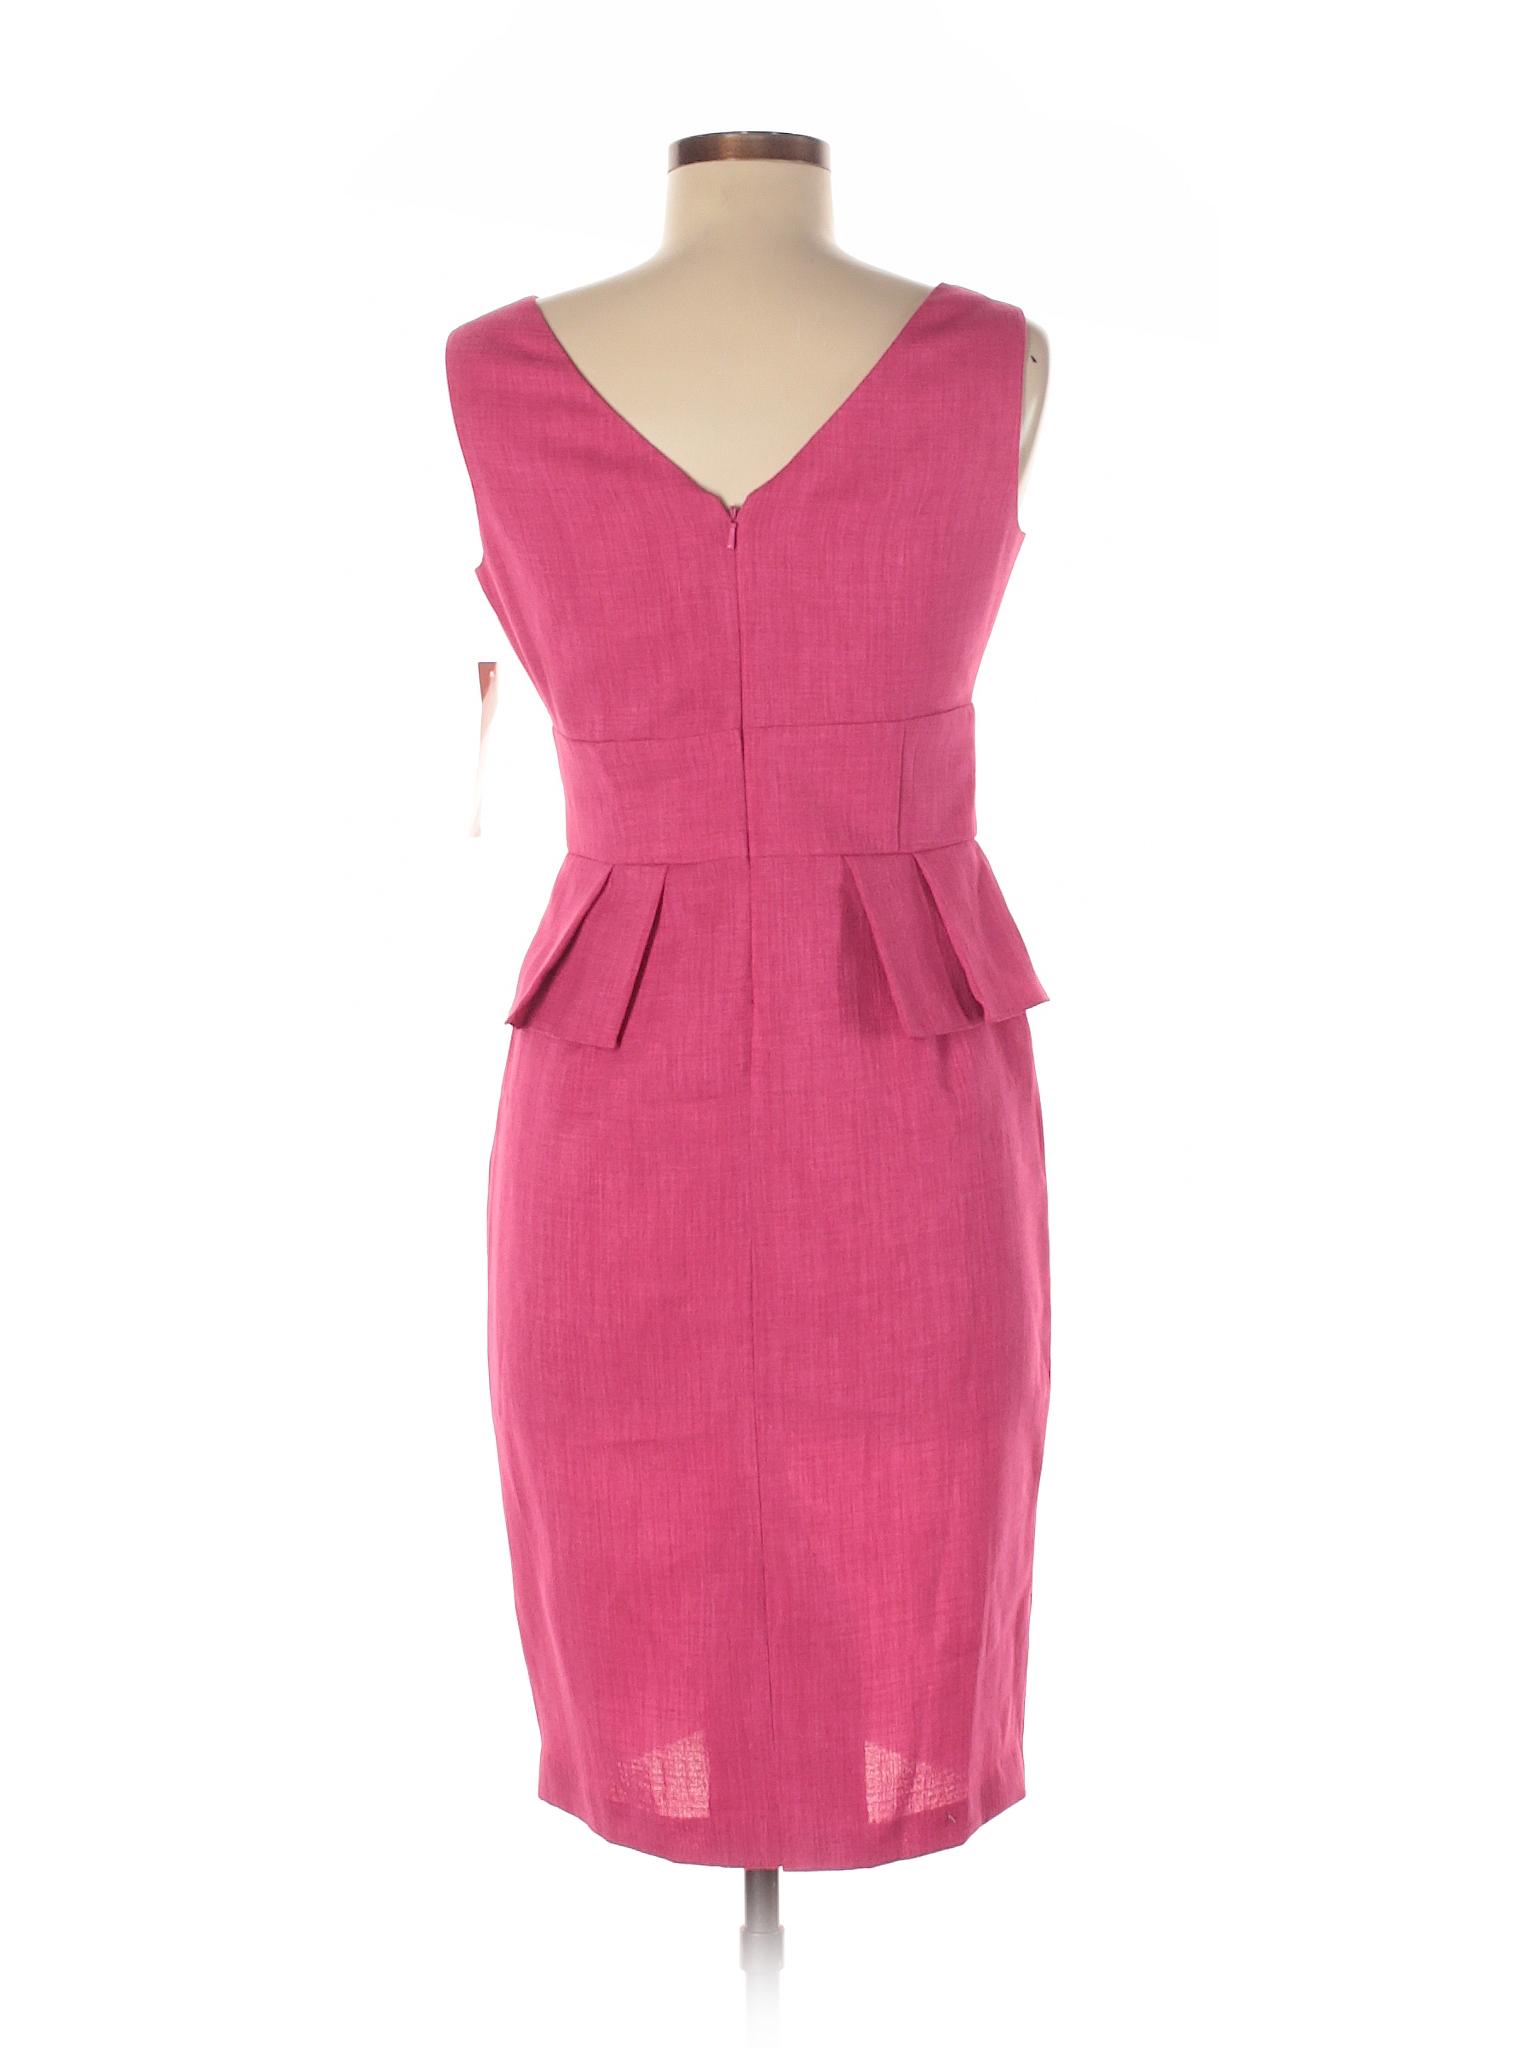 Picone Dress Evan Casual Selling Picone Evan Casual Picone Evan Selling Selling Dress x7q7wznFRA